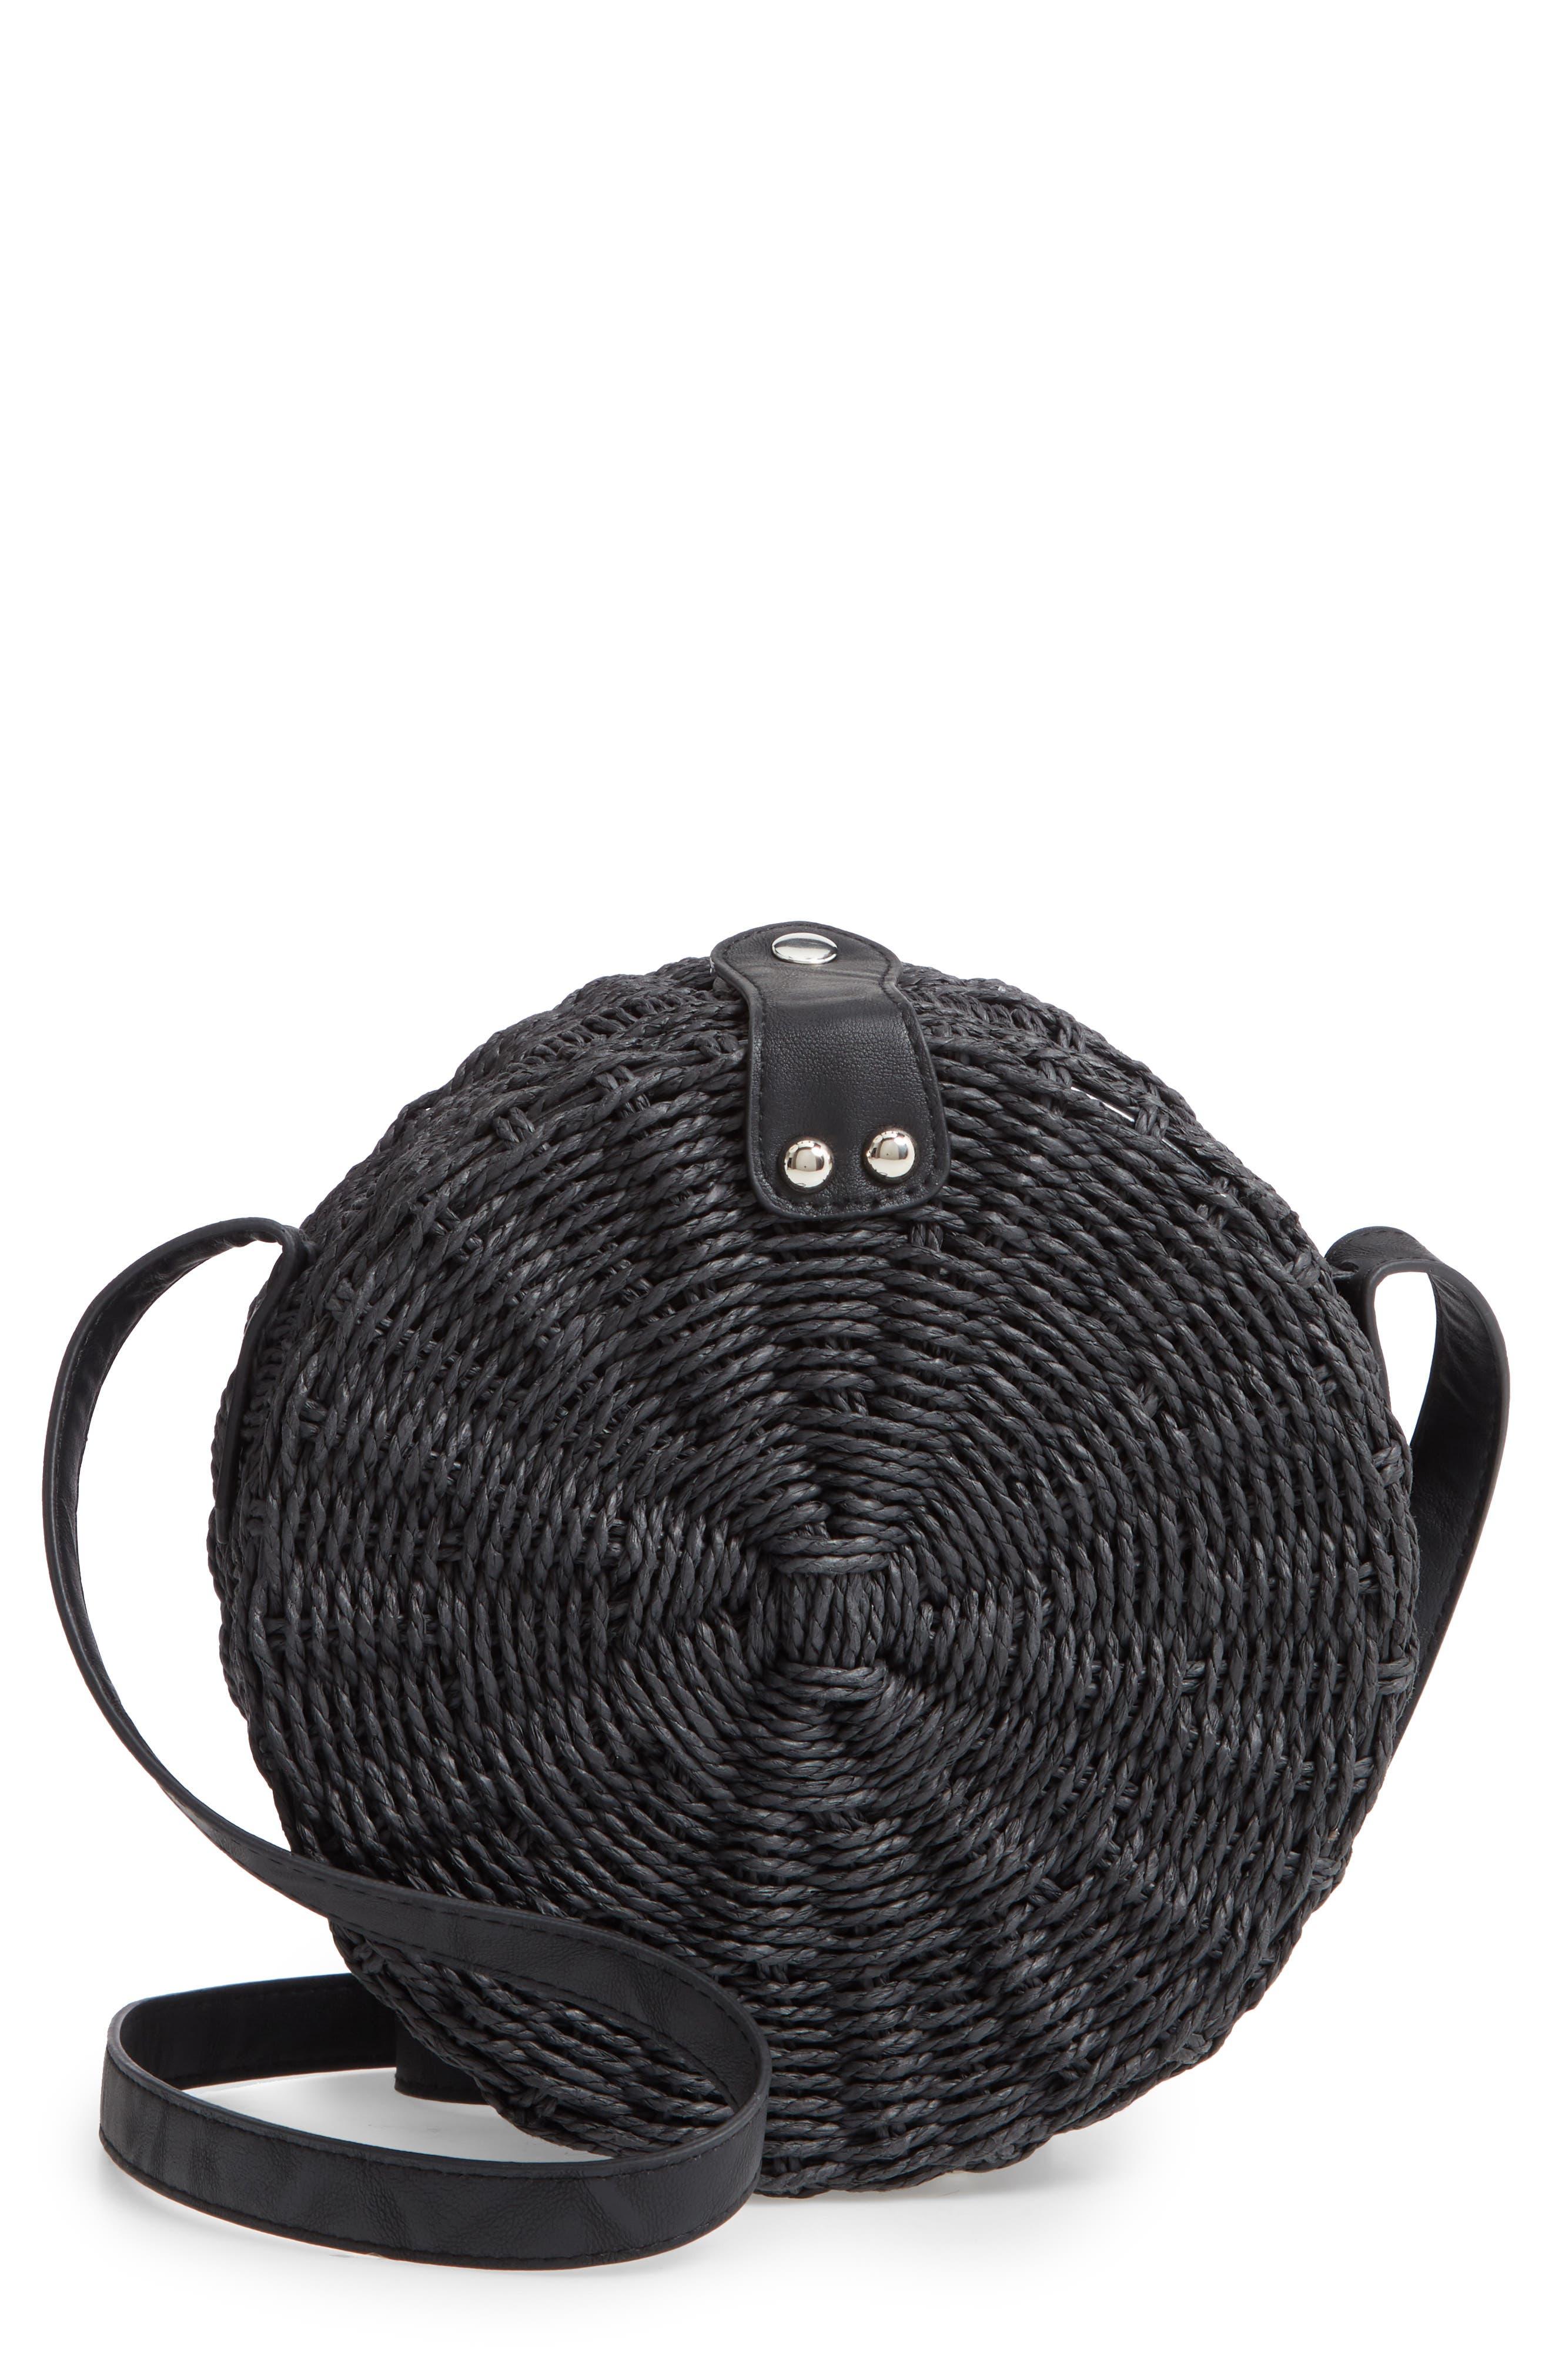 Barbar Straw Crossbody Bag,                         Main,                         color, 001